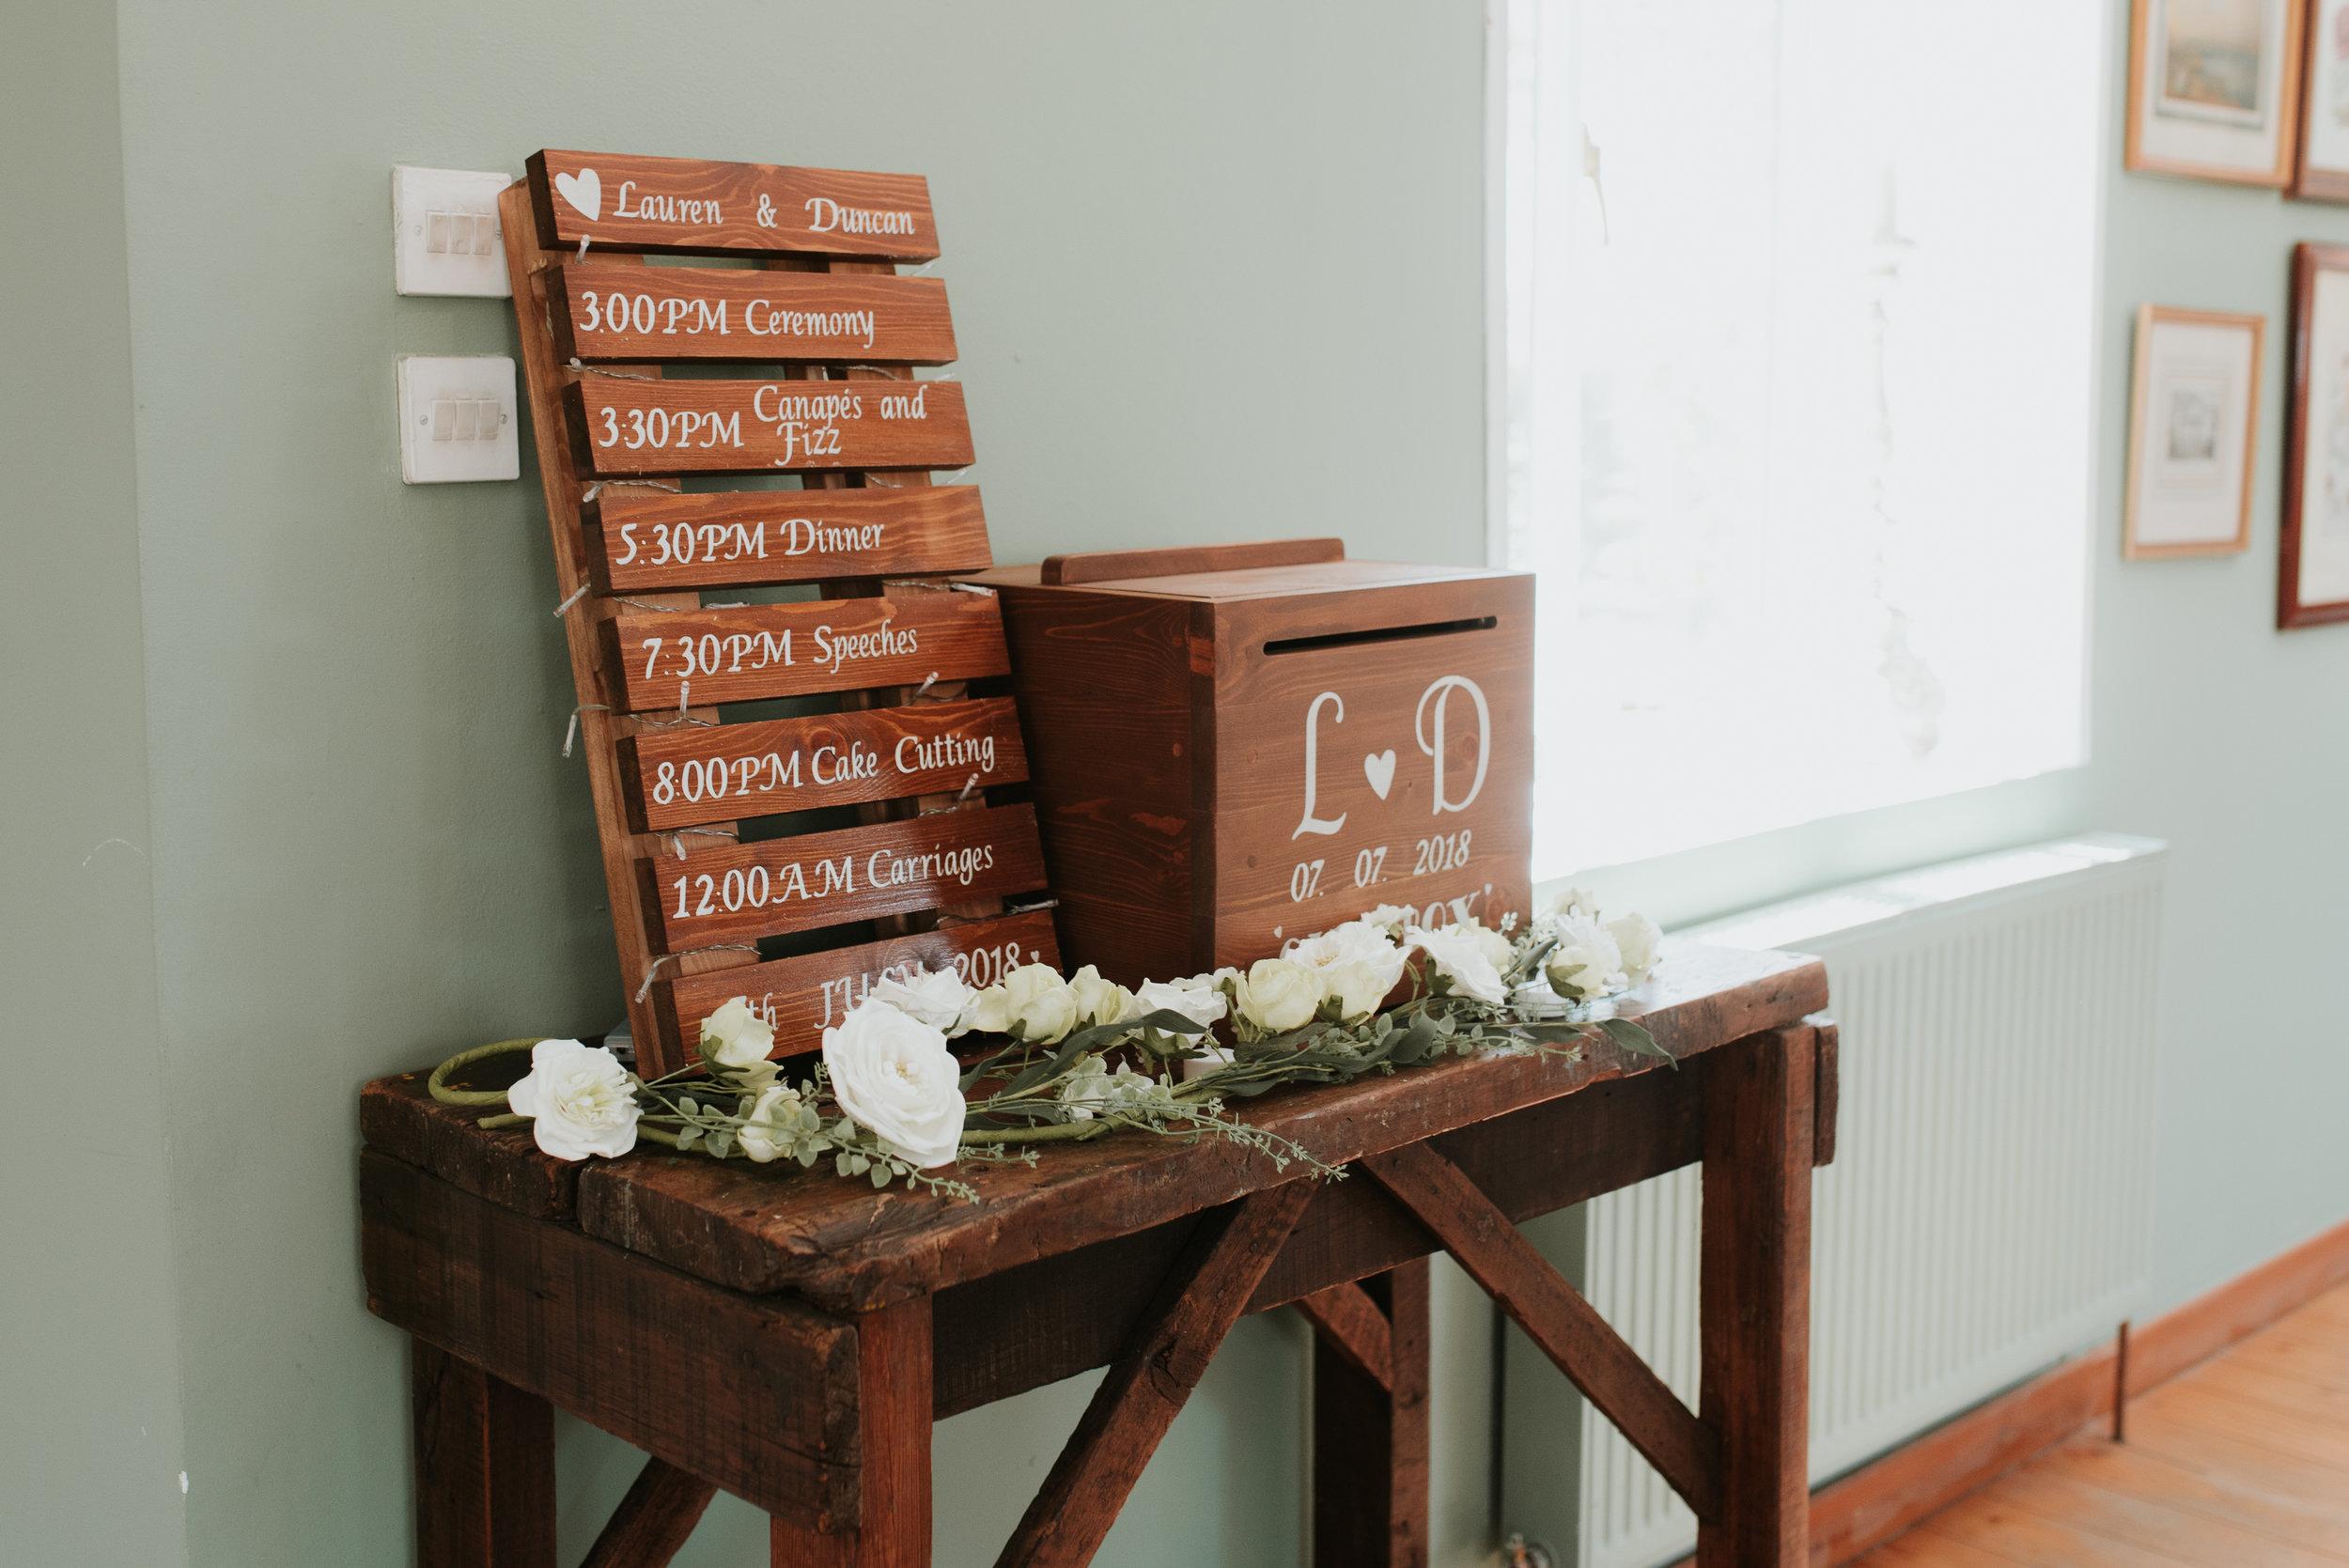 Oxfordshire-wedding-photographer-2.jpg